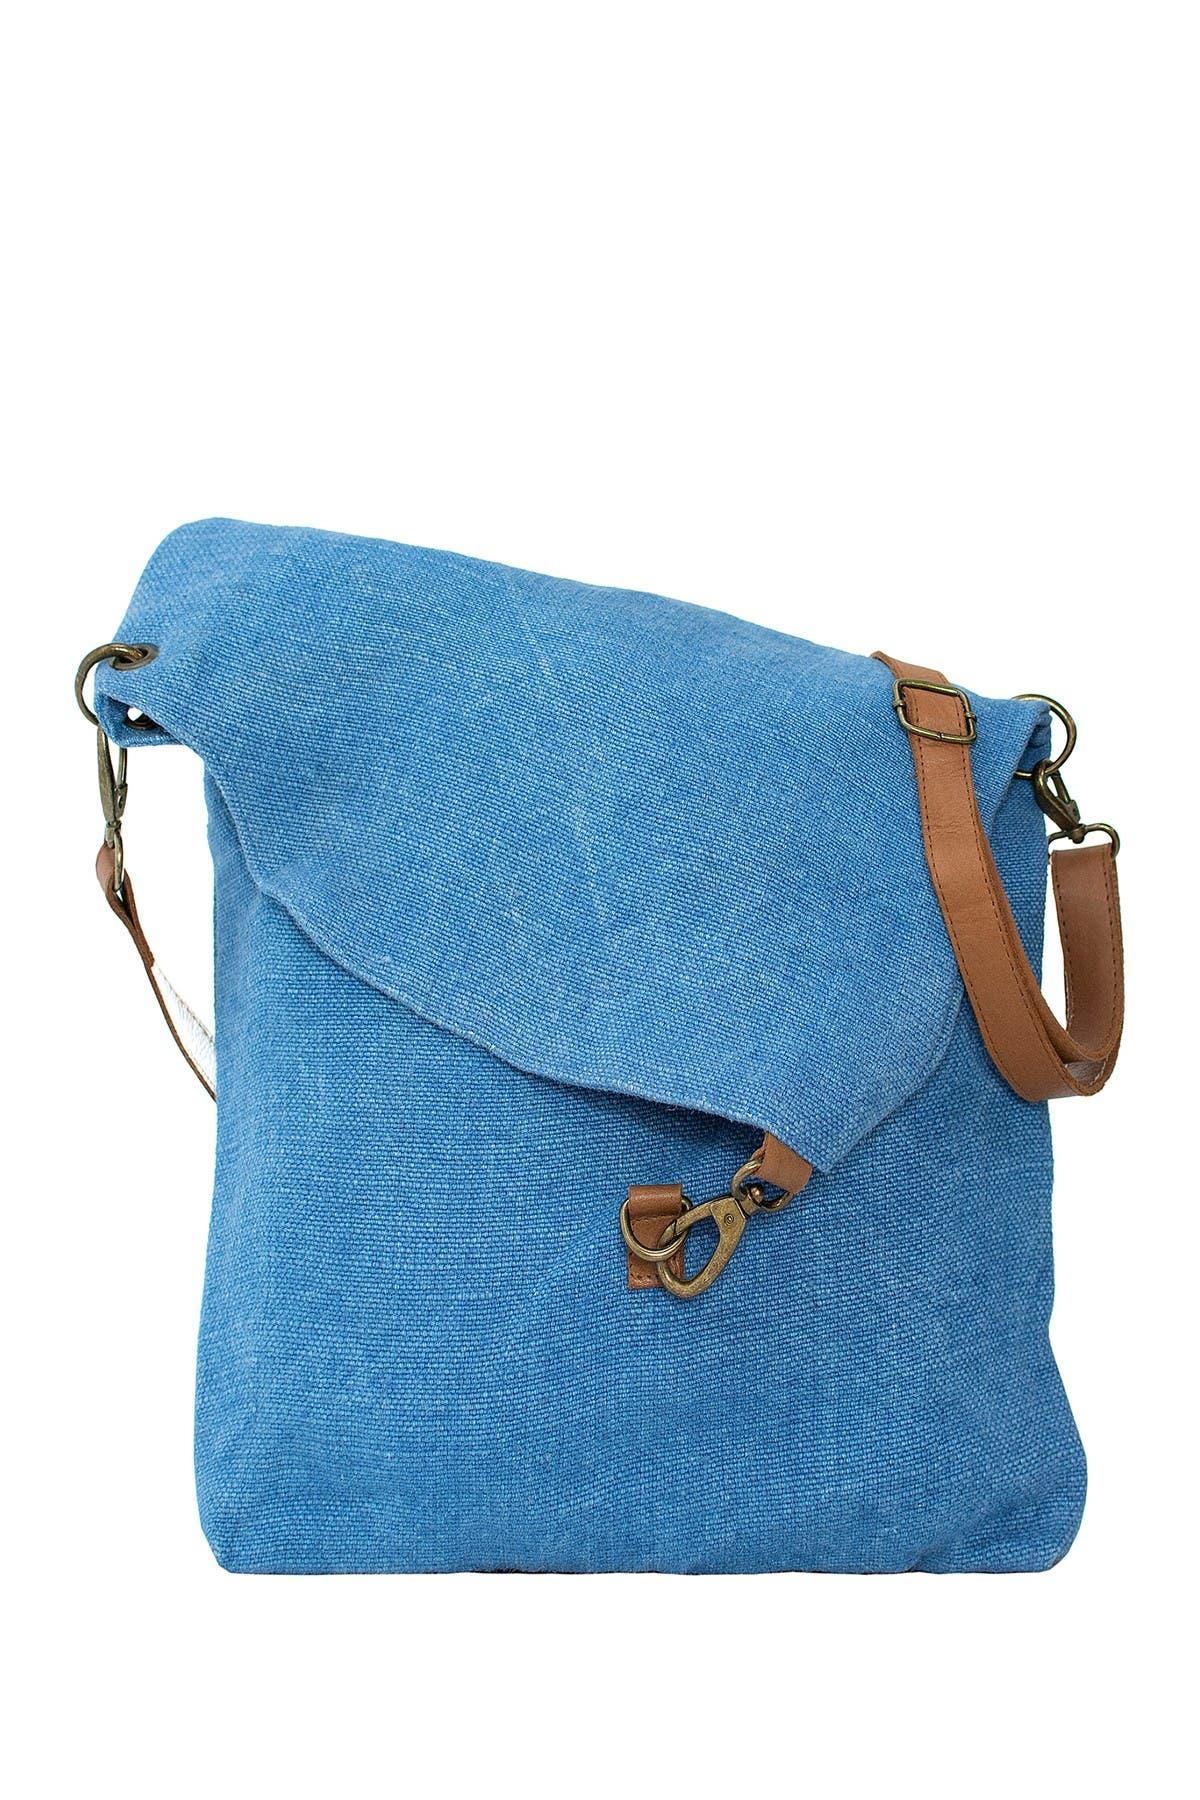 Image of Vintage Addiction Foldover Jute & Leather Crossbody Bag